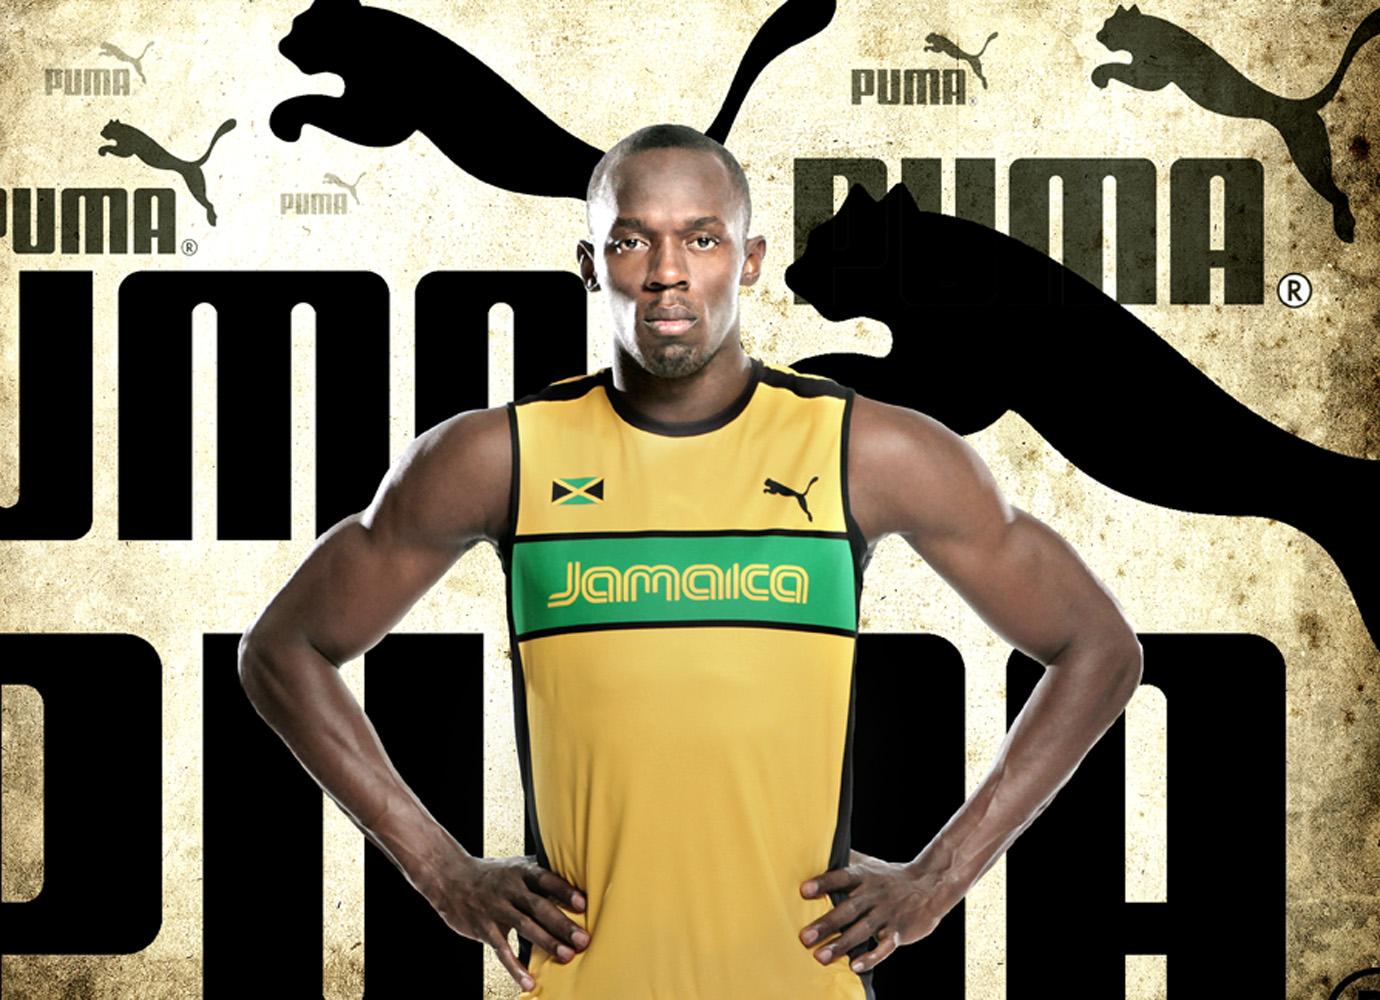 Puma Usain Bolt Running Shoes